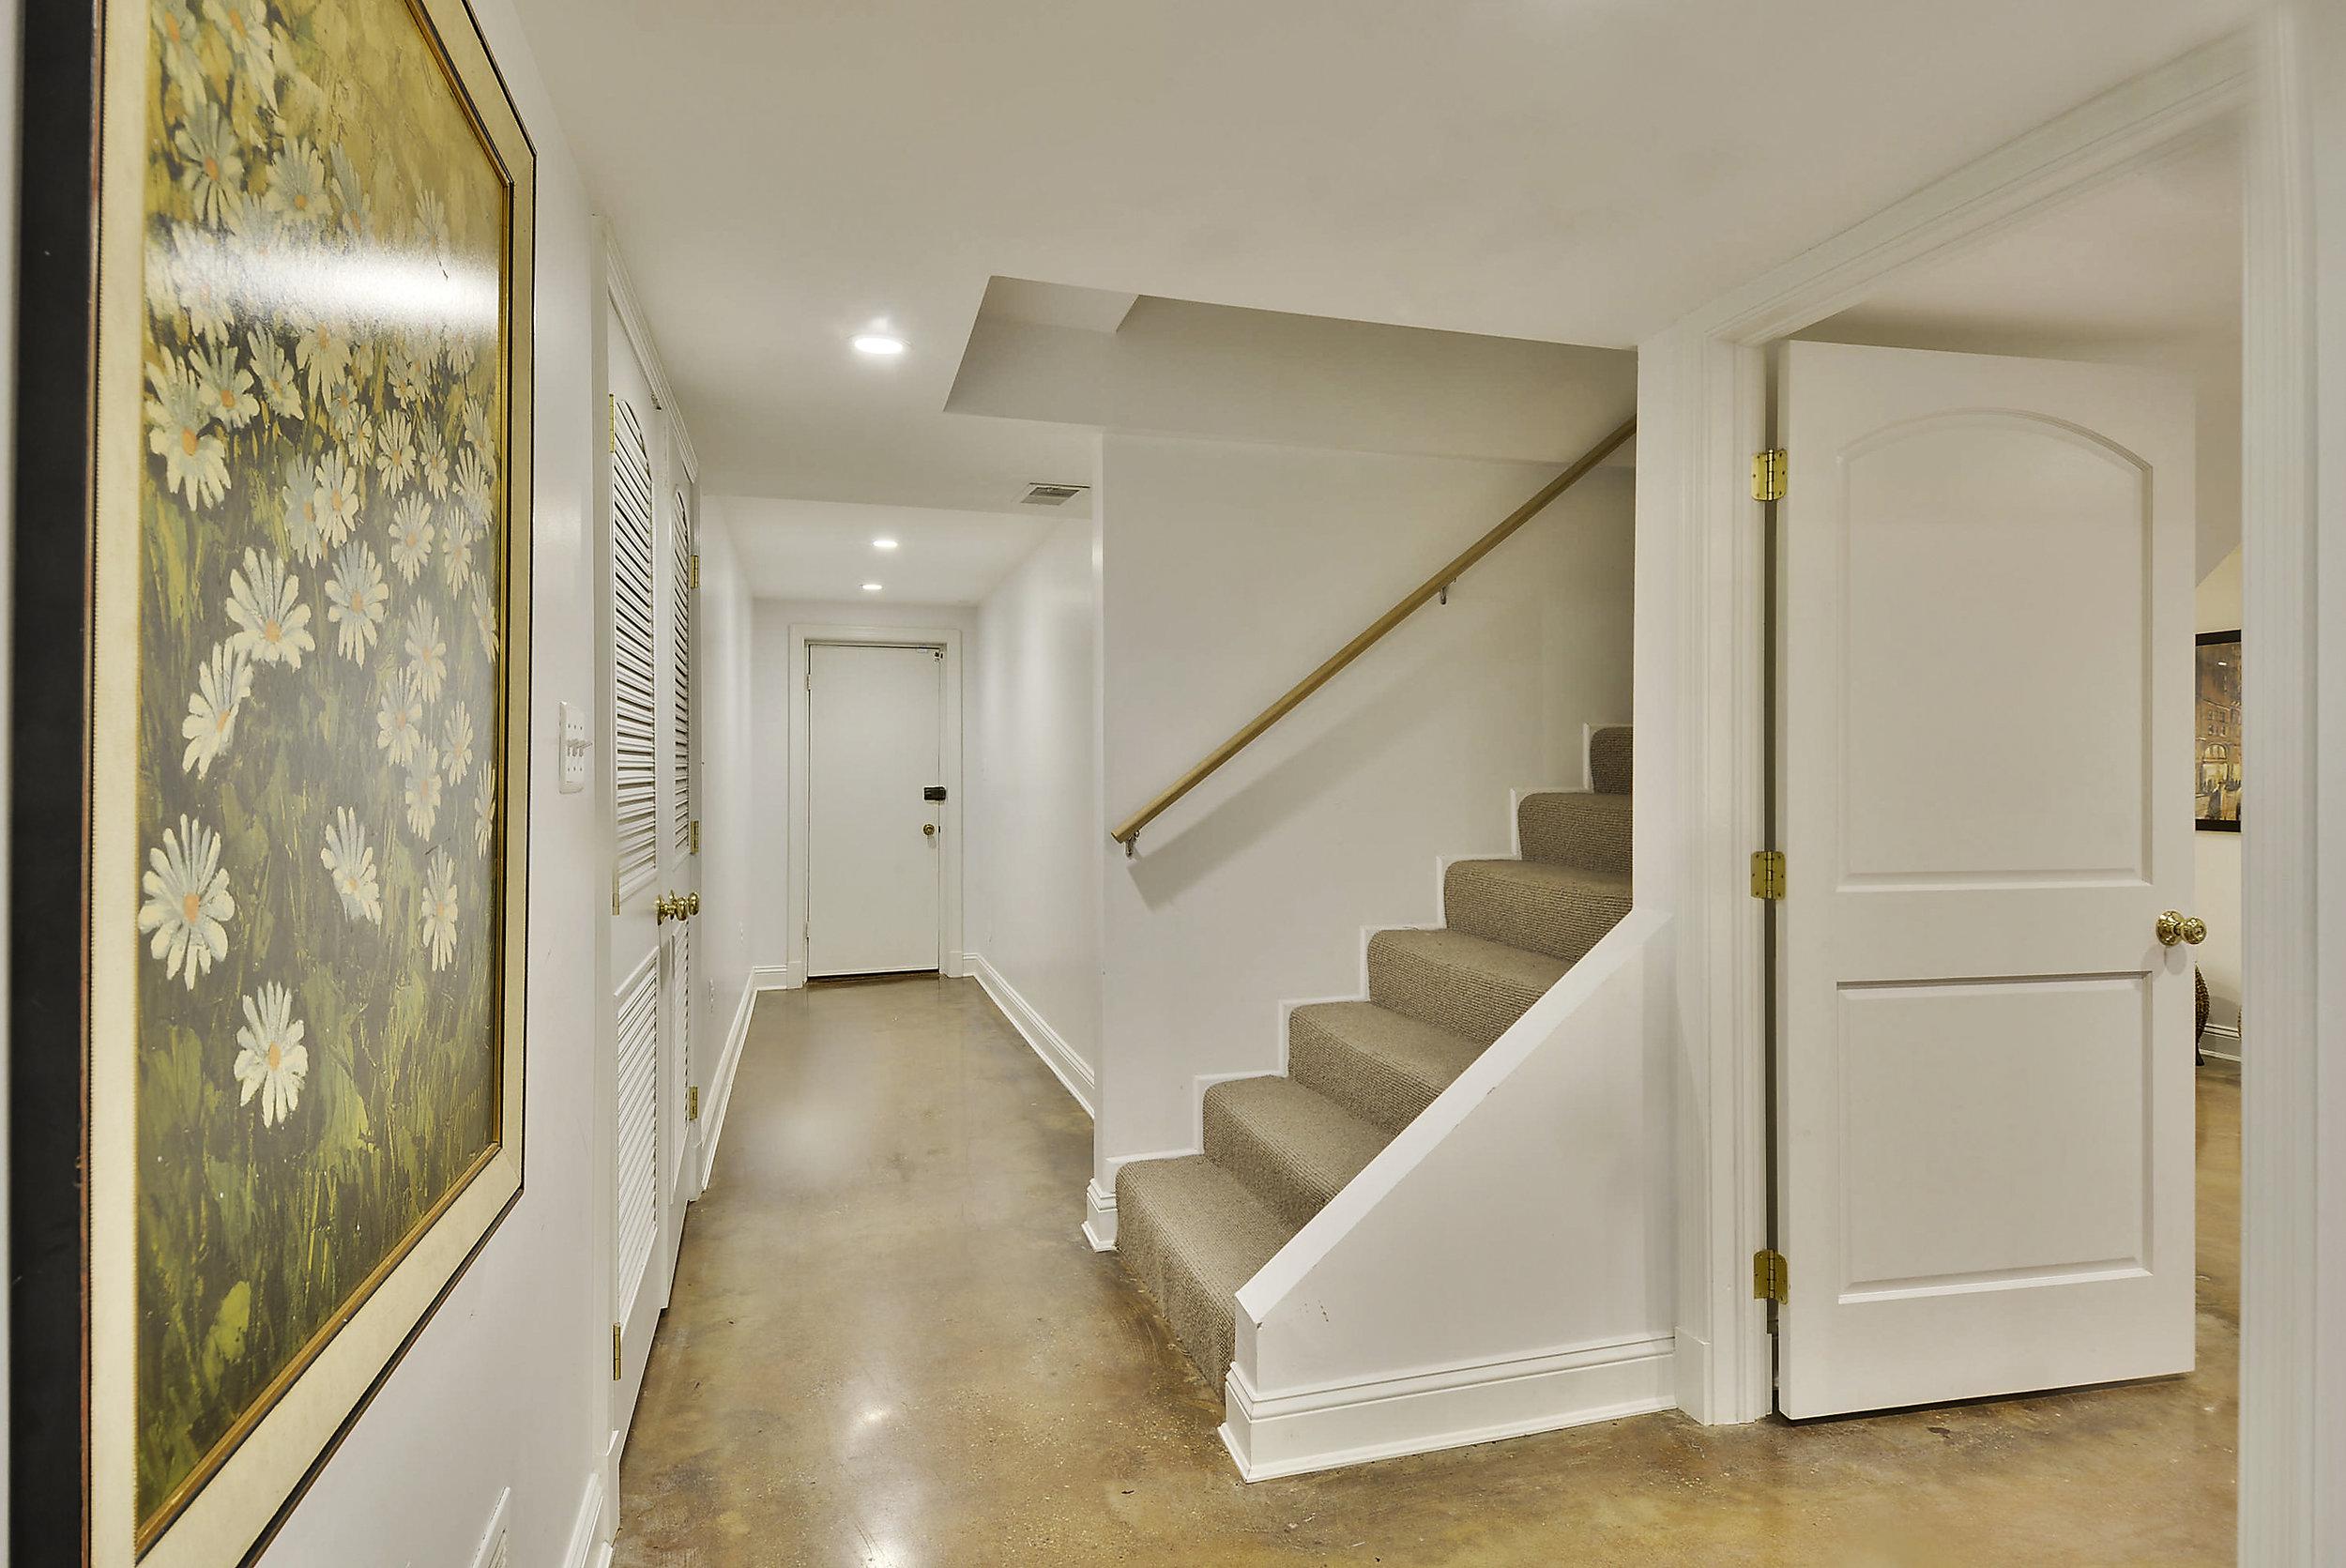 Lower Level-Stairs-_DSC5859.JPG